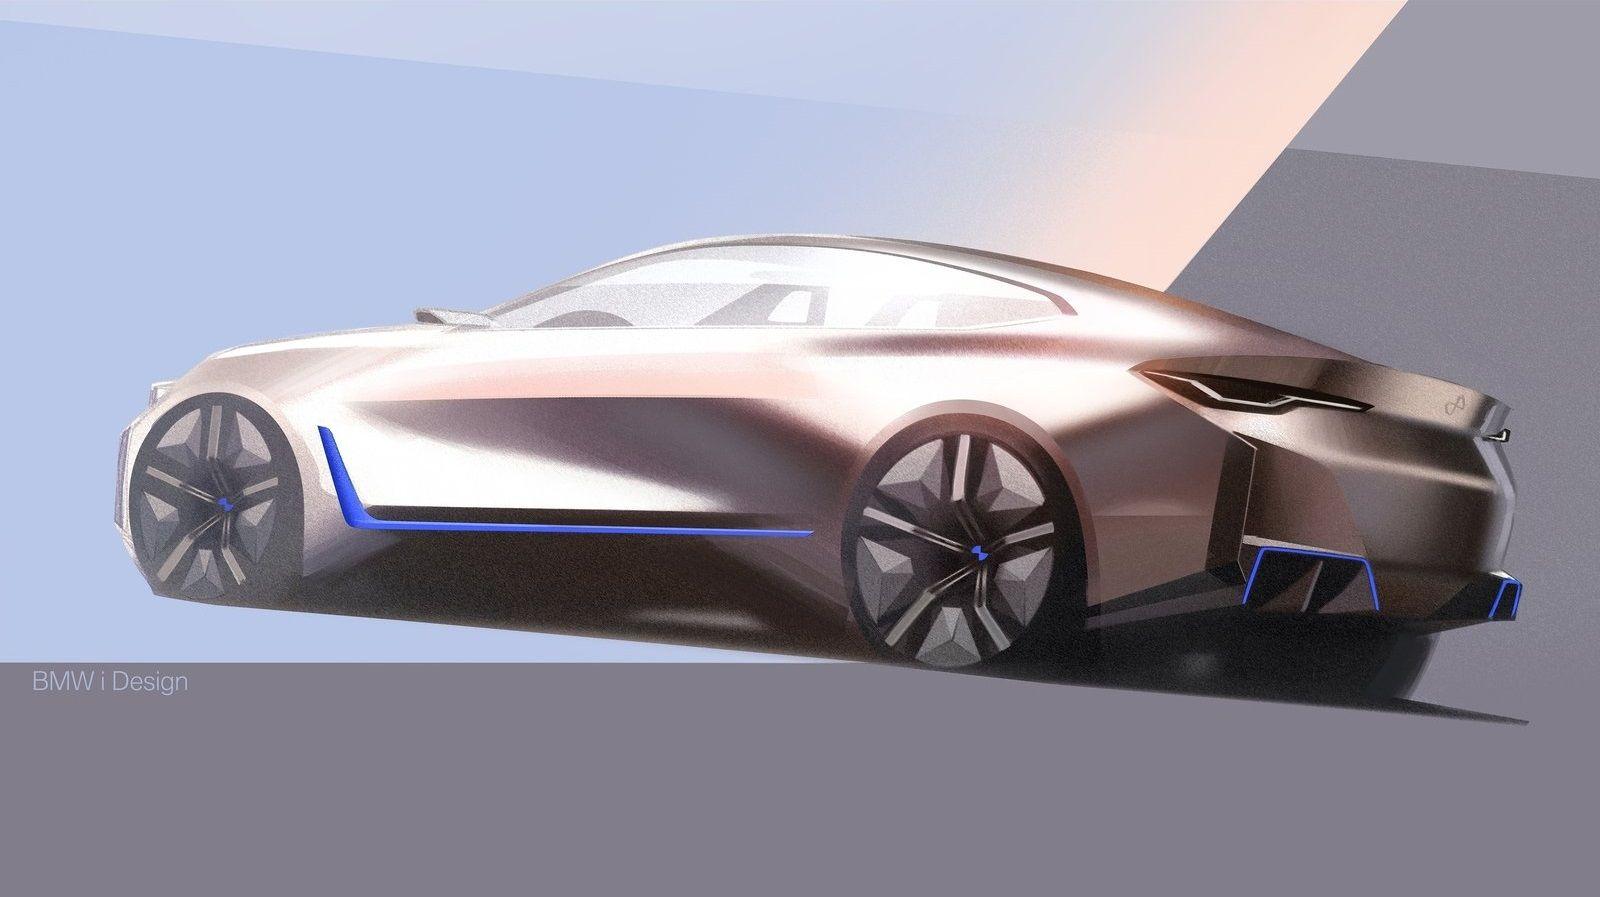 2020 Bmw I4 Concept In 2020 Bmw Concept Bmw Design Bmw